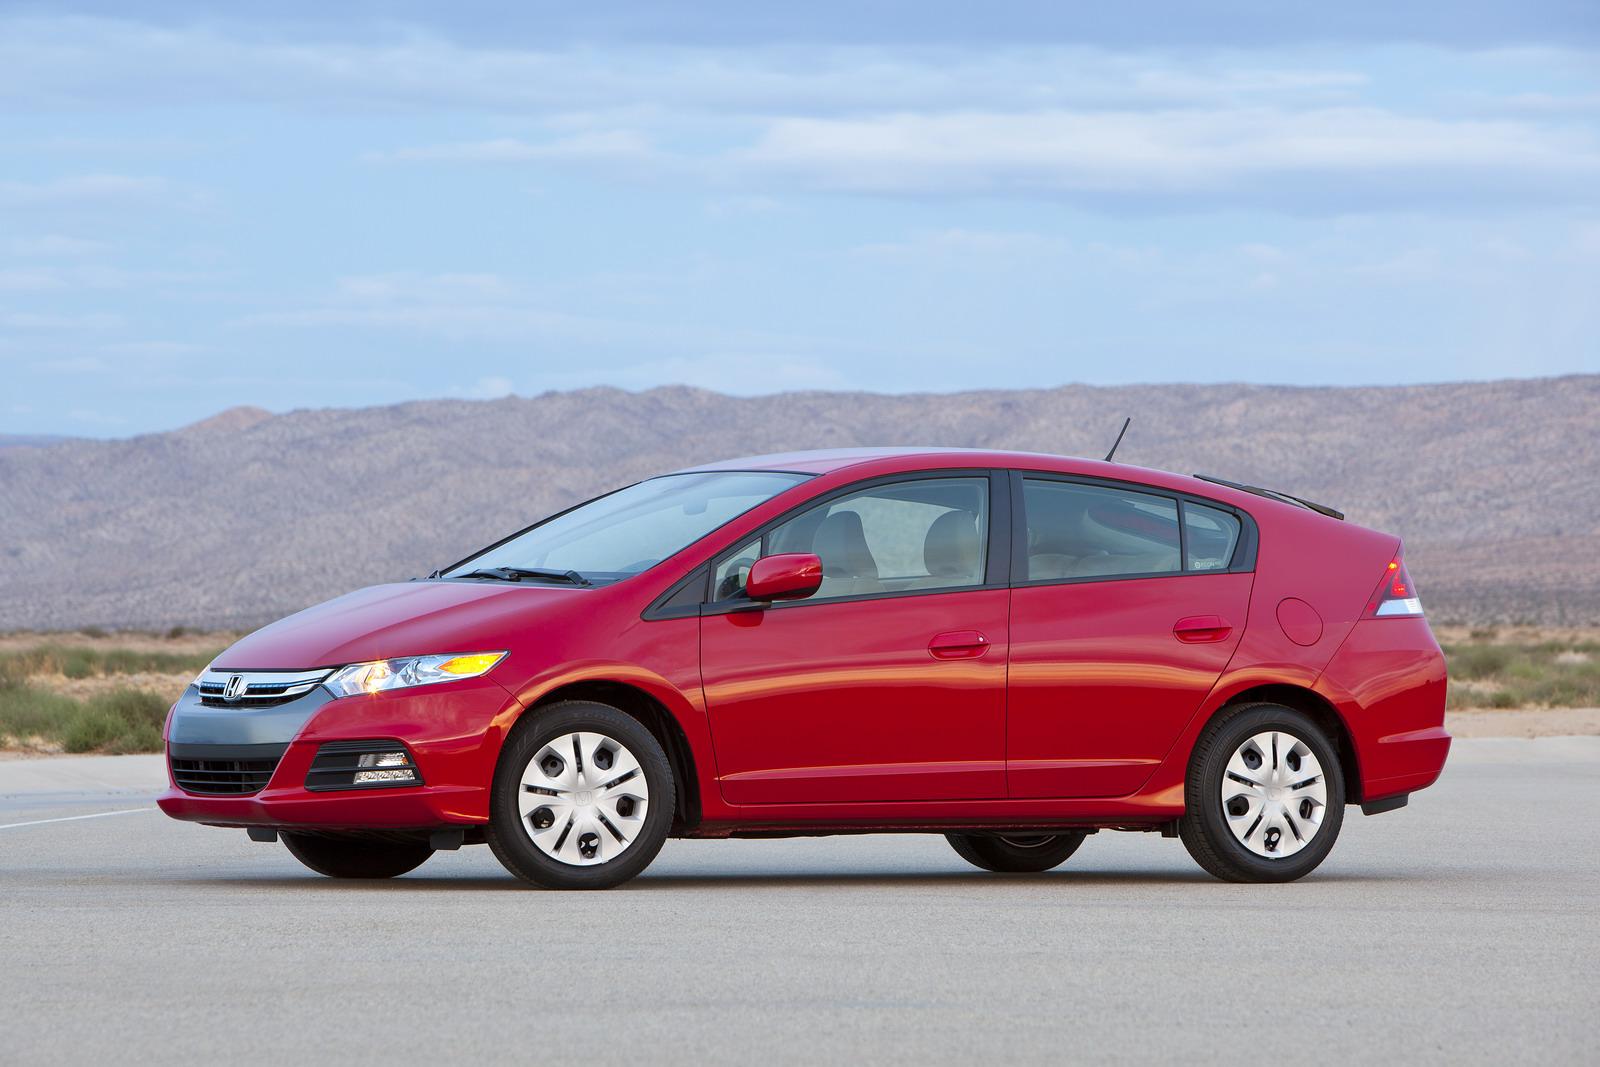 2012 Honda Insight Hybrid Introduced in the US - autoevolution